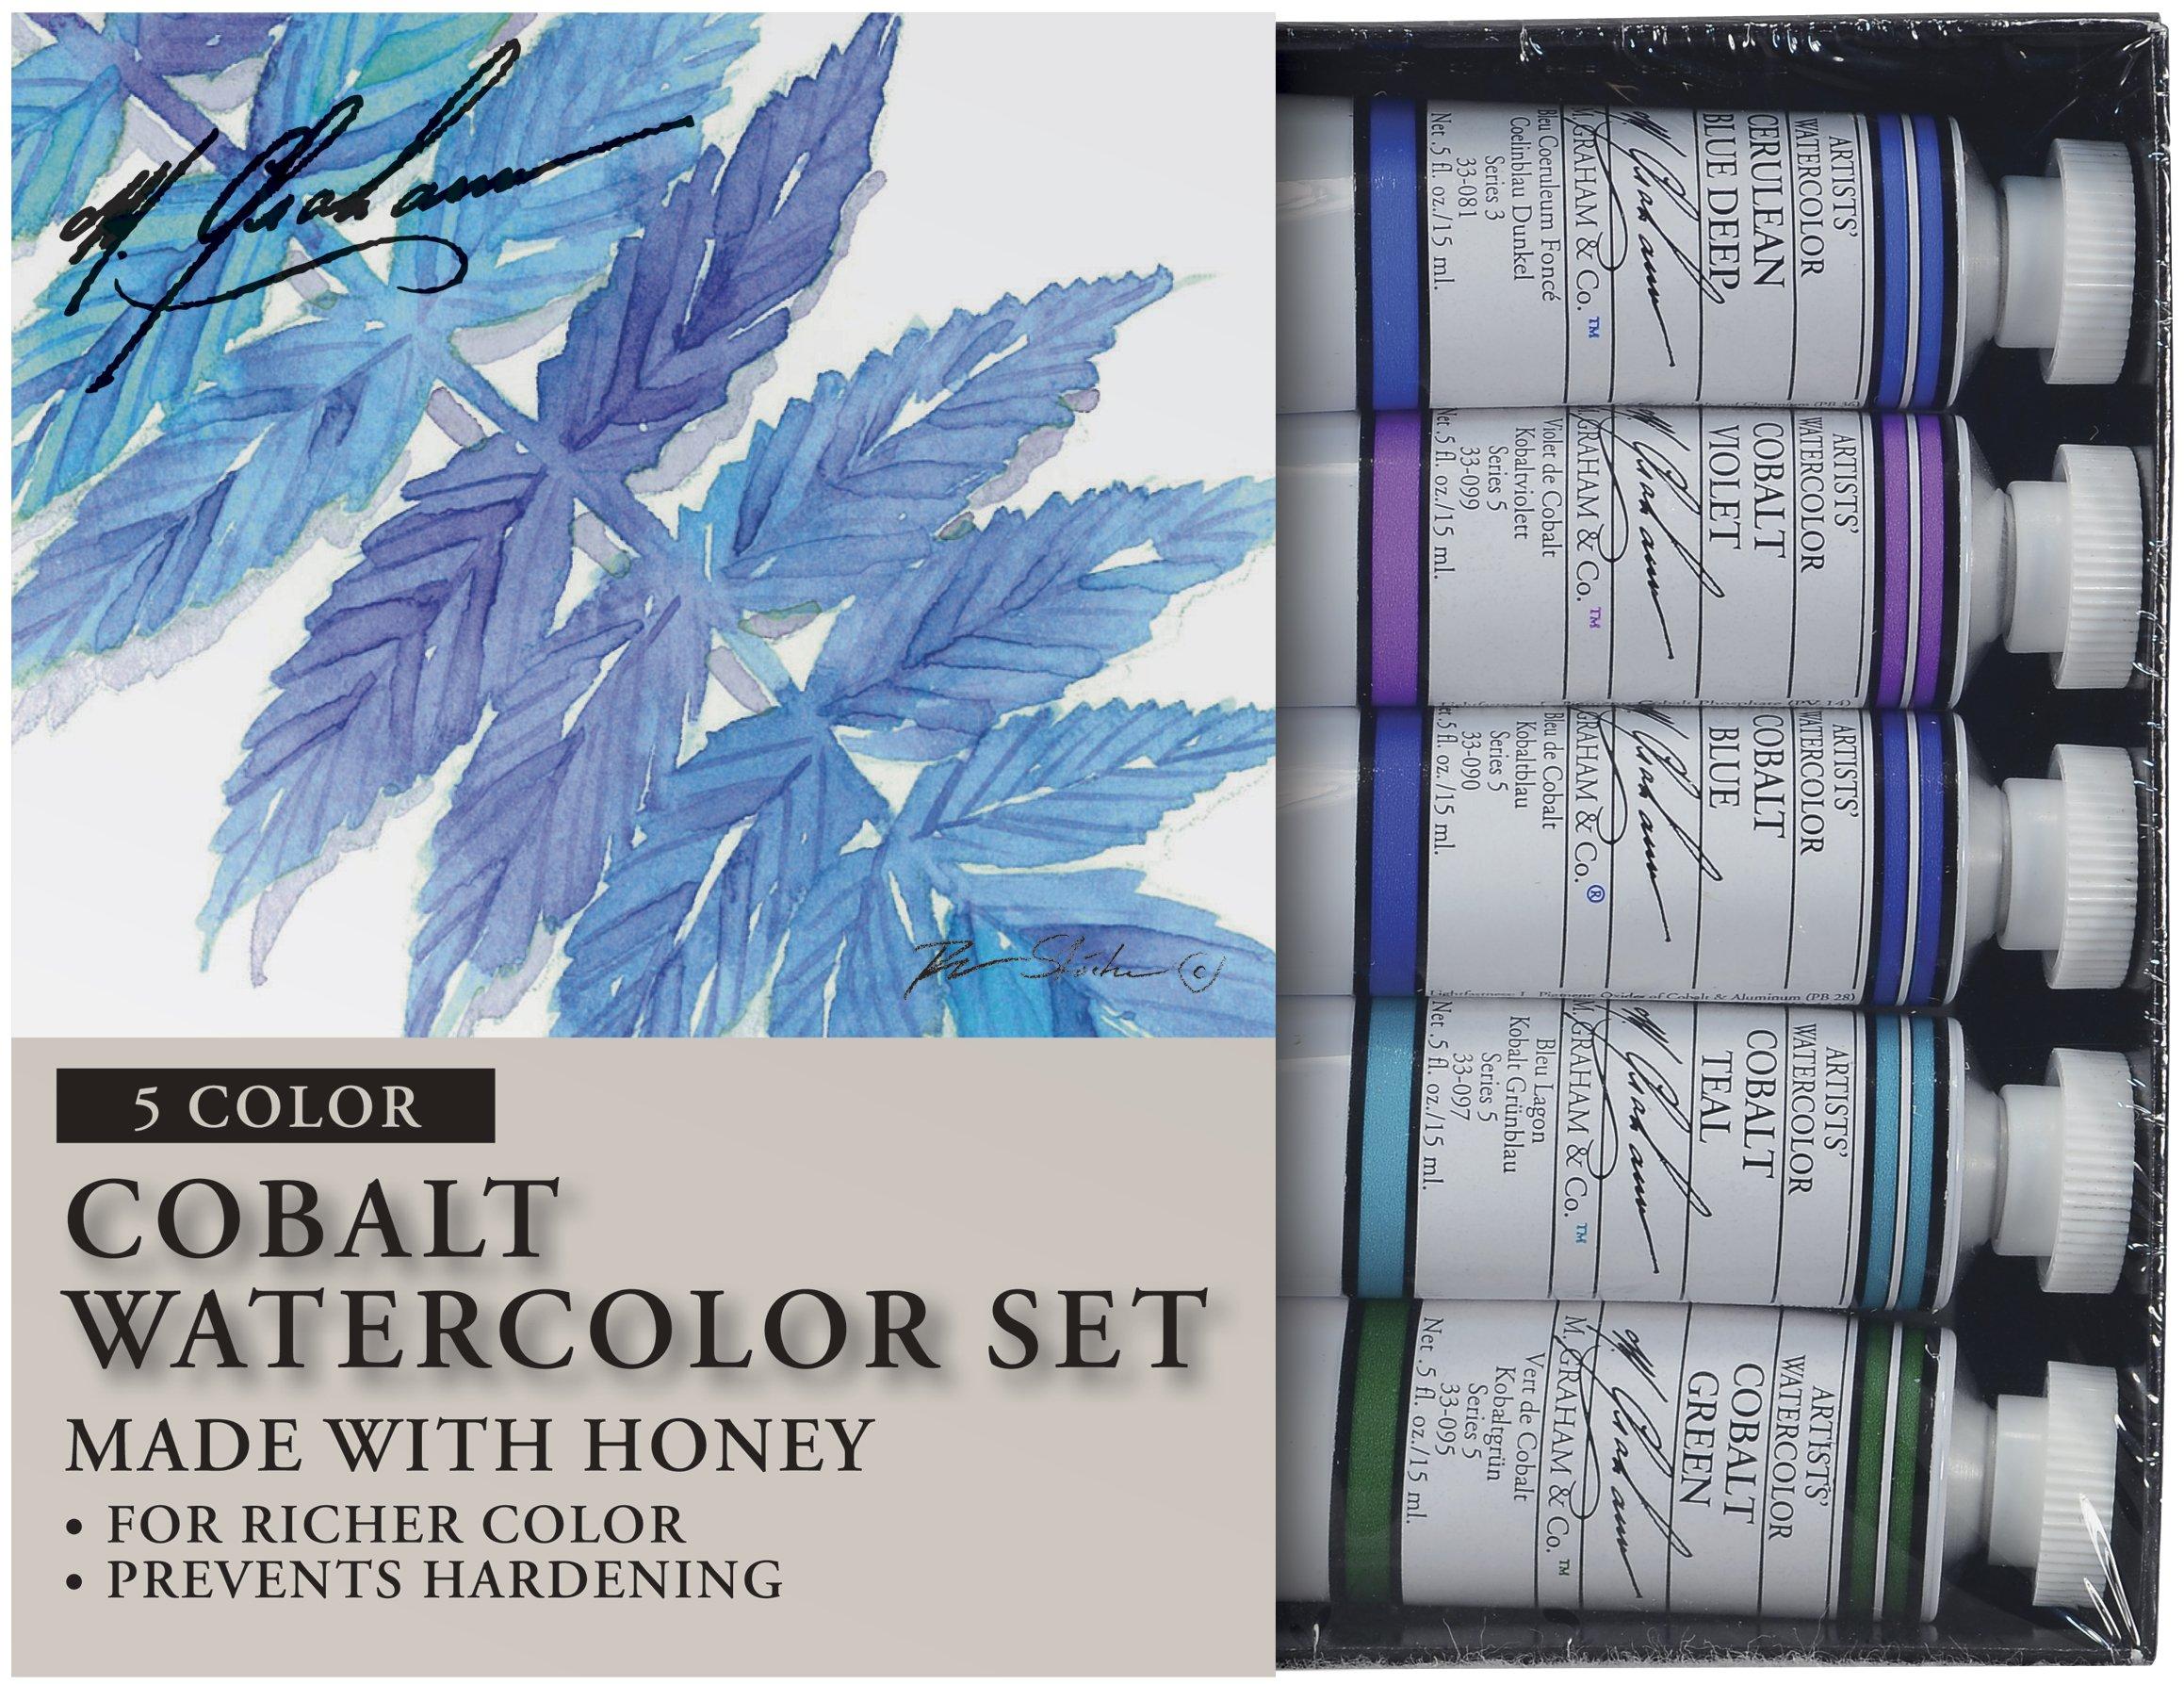 ویکالا · خرید  اصل اورجینال · خرید از آمازون · M. Graham Tube Watercolor Paint Cobalt Mix 5-Color Set, 1/2-Ounce wekala · ویکالا